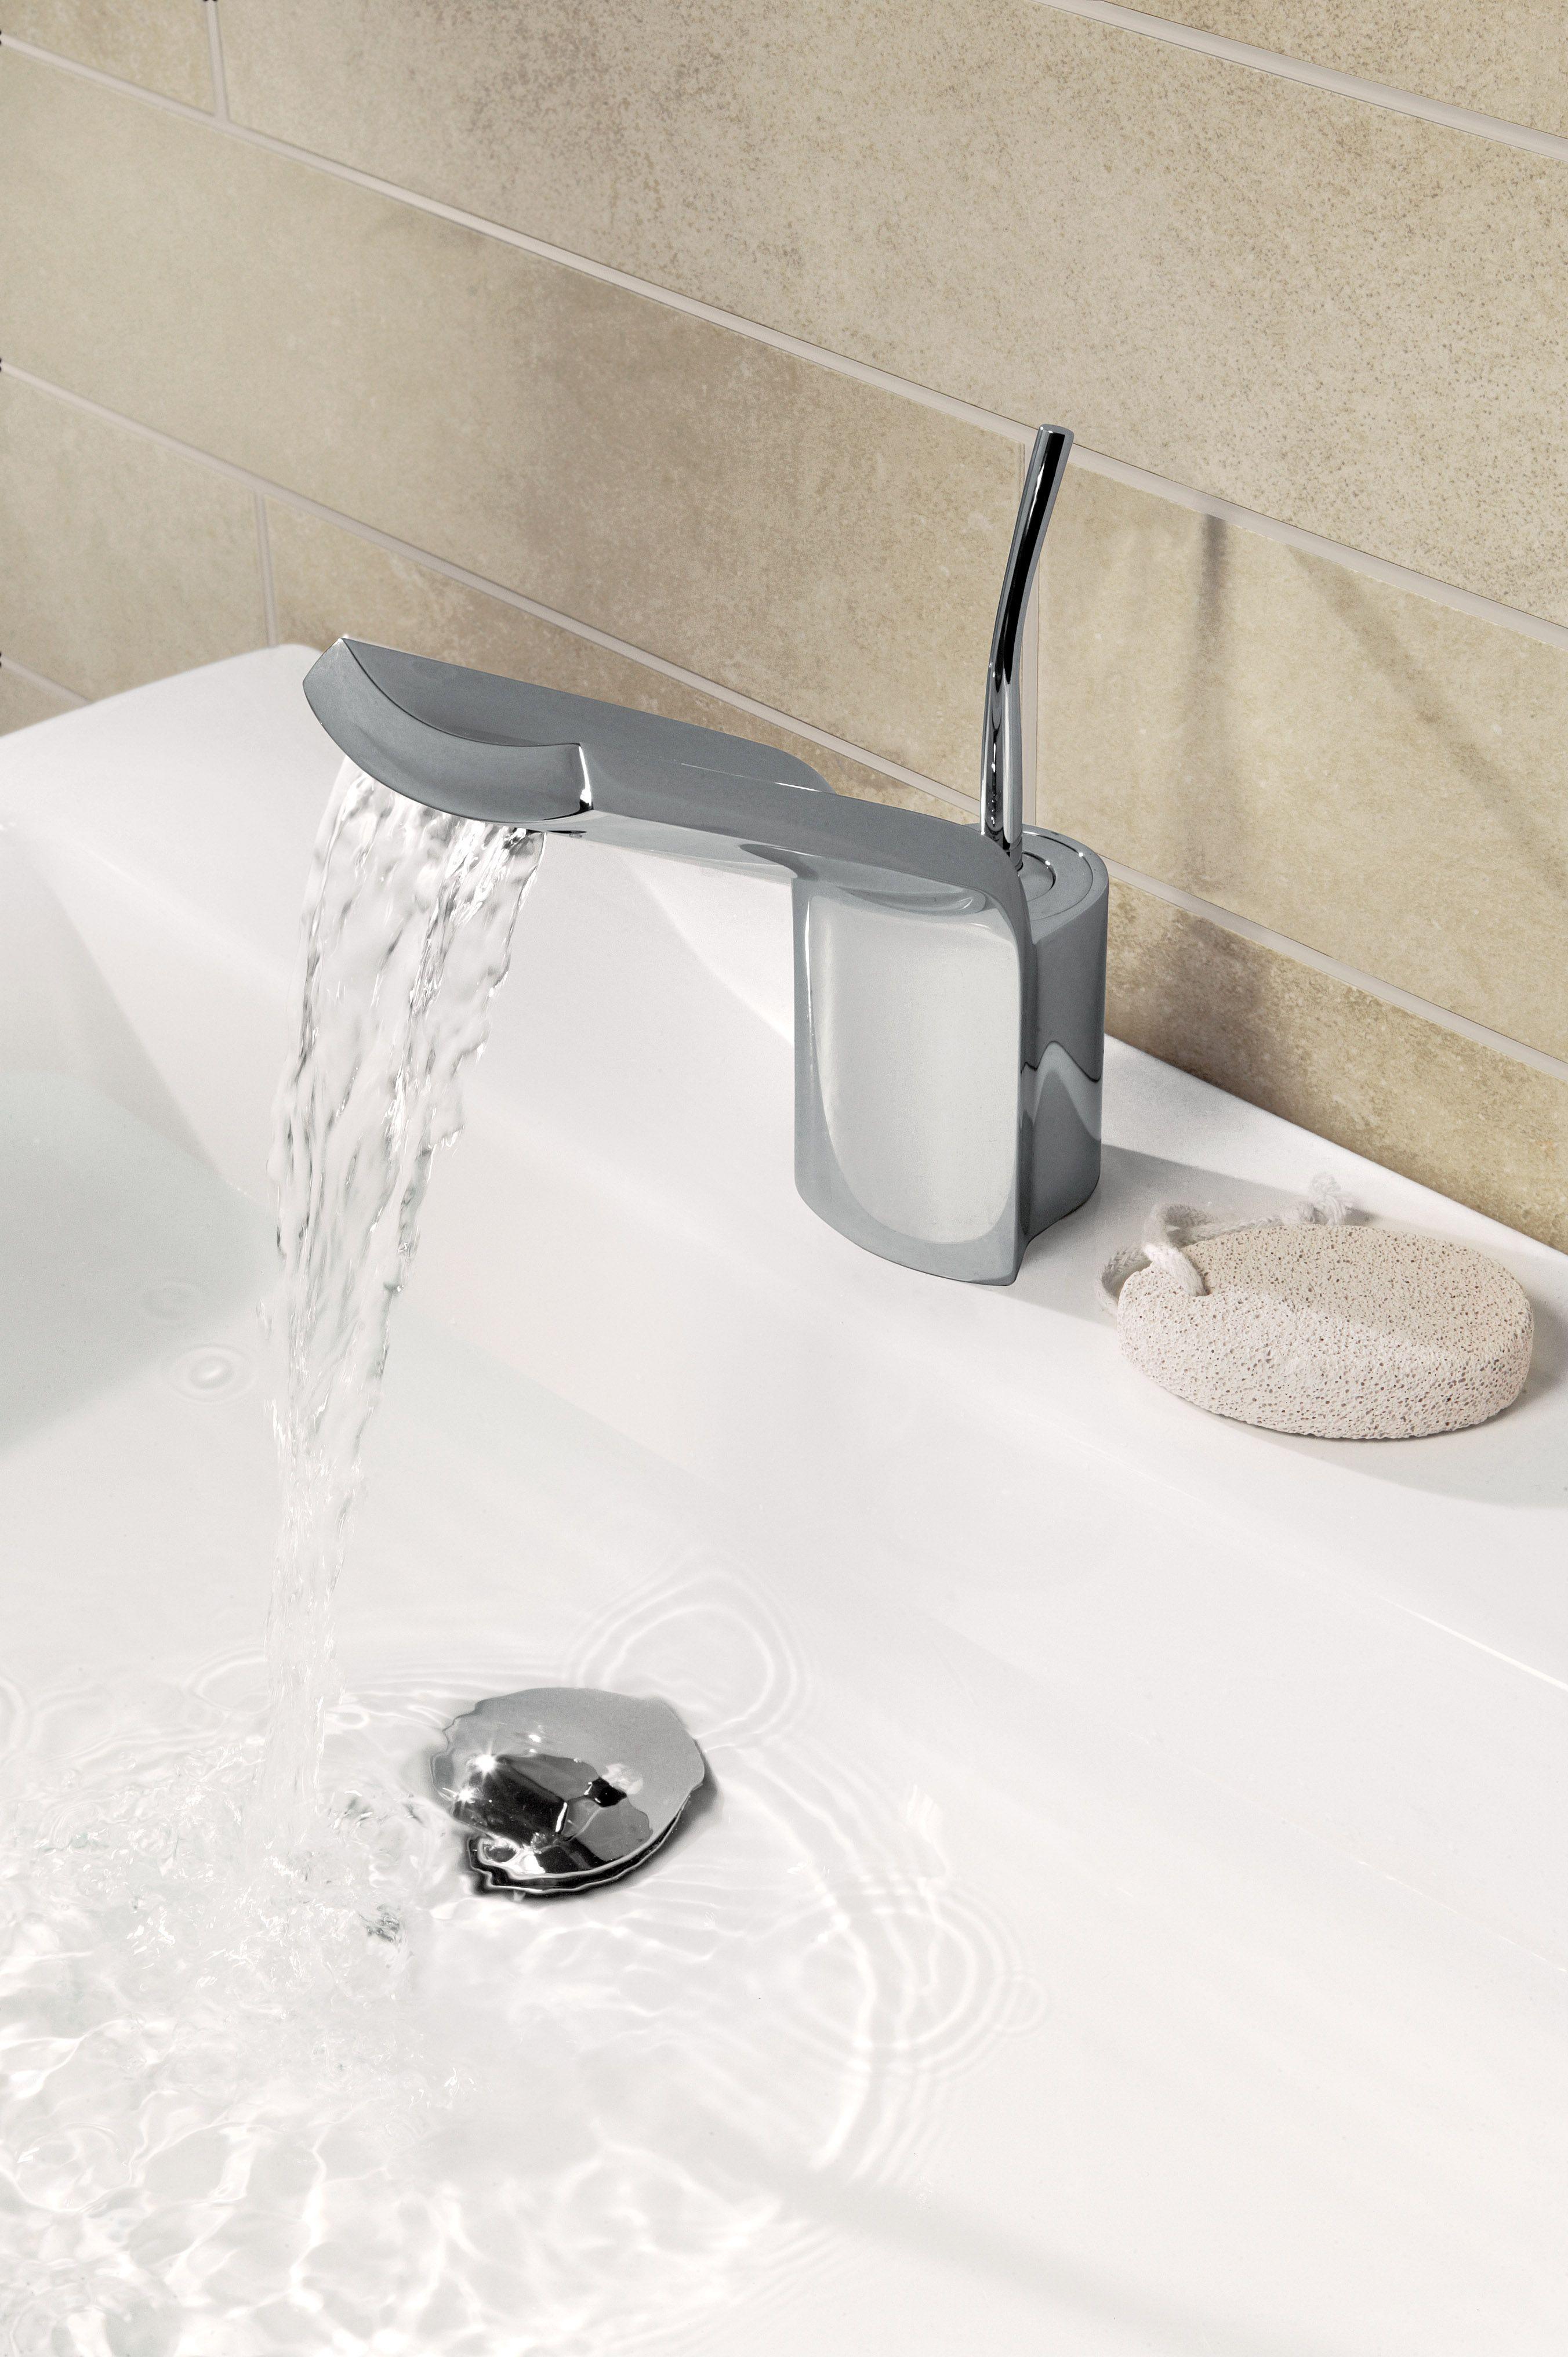 Glide Monobloc Bathroom Basin Tap From Crosswater Http Www Crosswater Co Uk Product Glide Glide Basin Monobloc